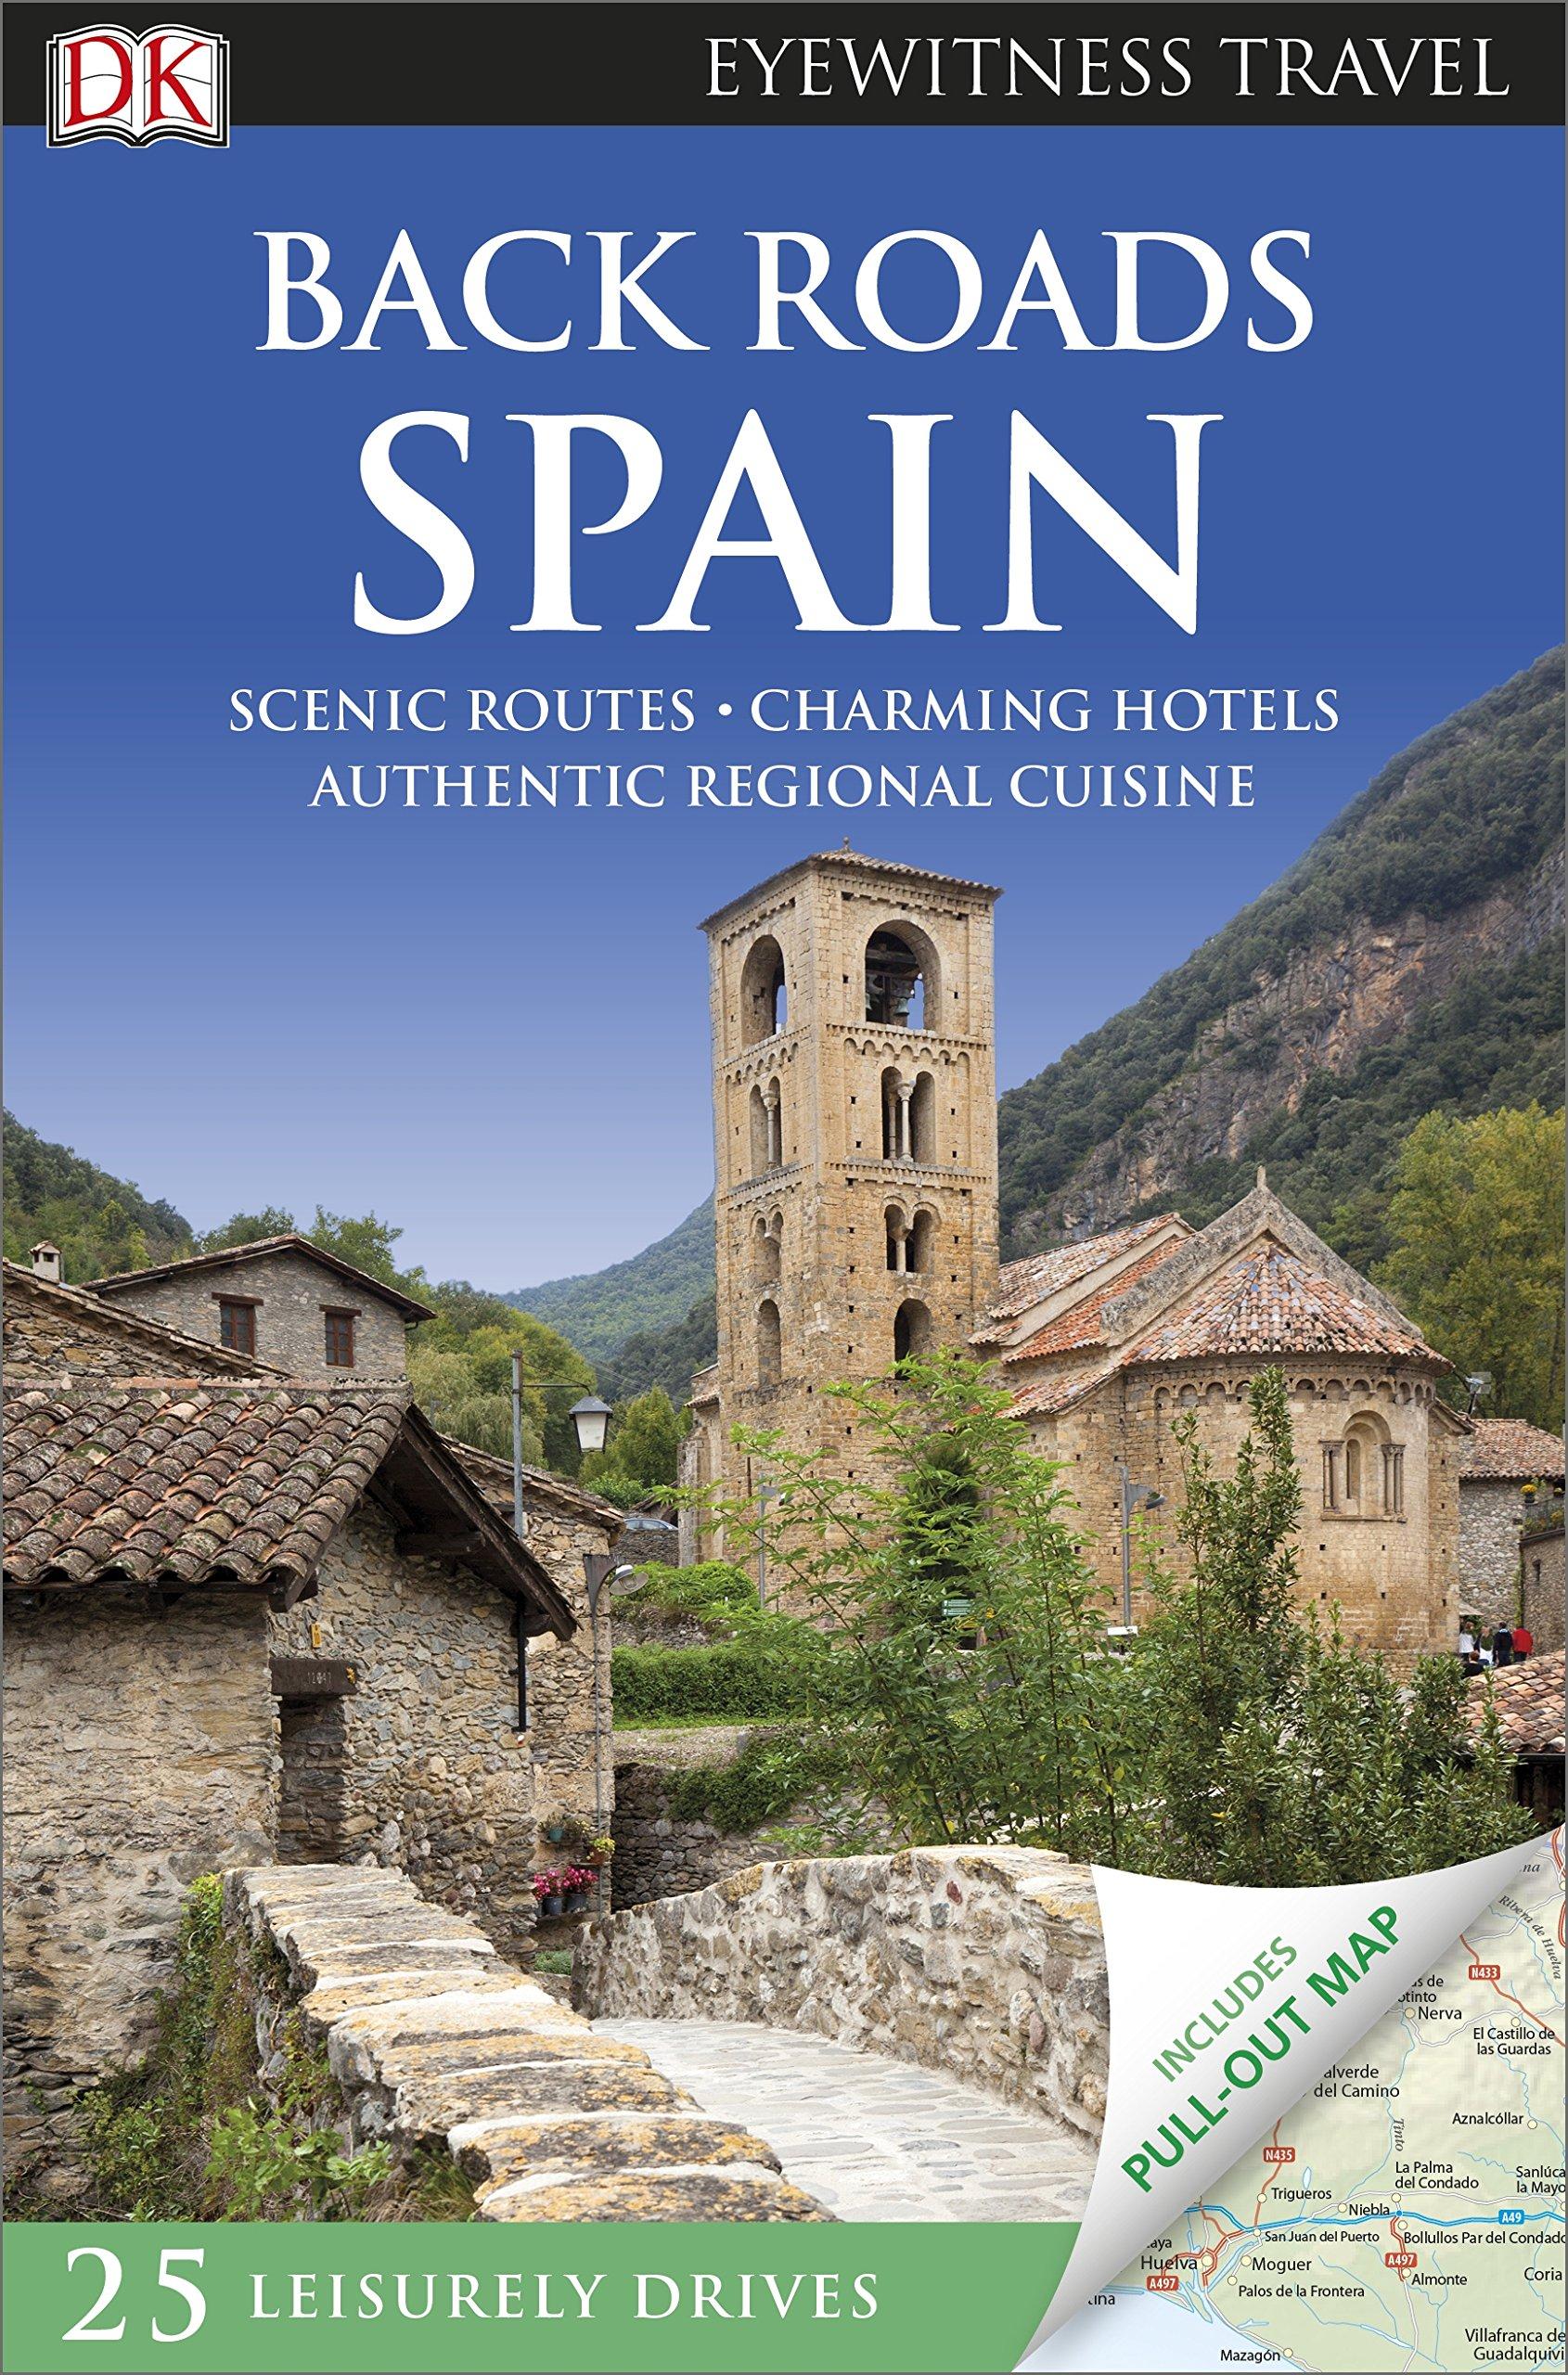 Spain Back Roads (DK Eyewitness Travel Guide): Amazon.es: Vv.Aa.: Libros en idiomas extranjeros